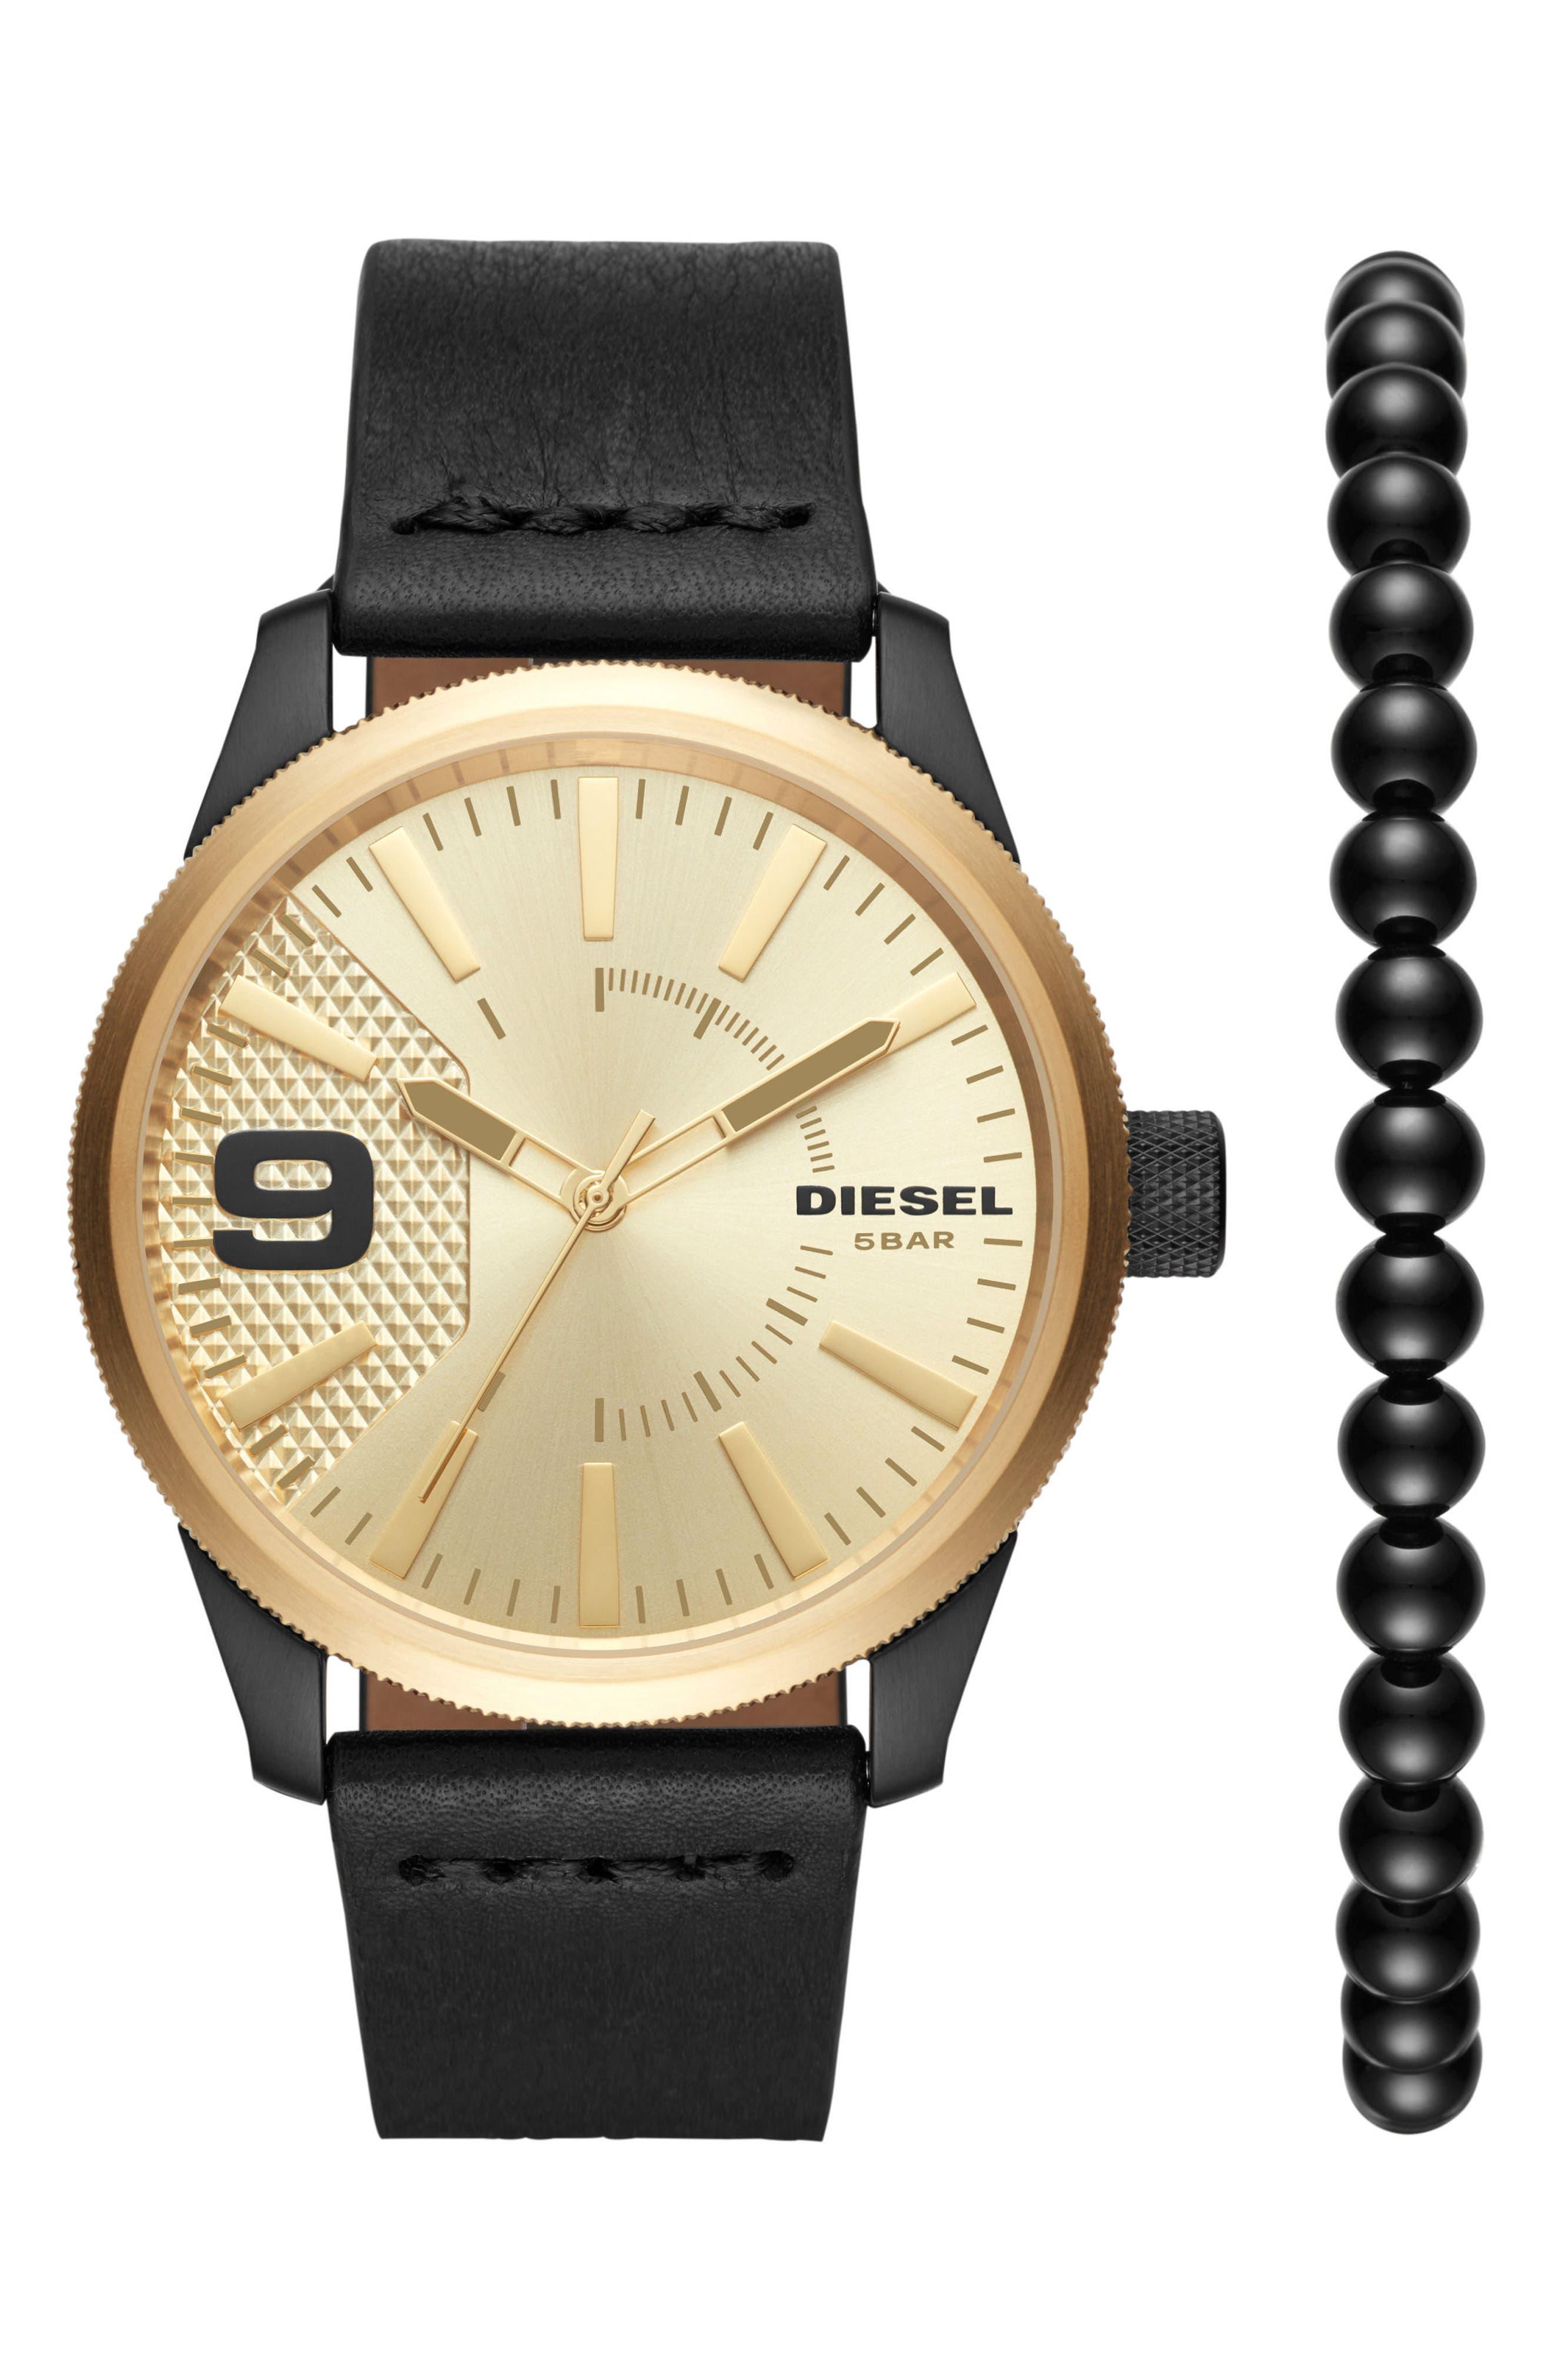 Main Image - DIESEL® Rasp Leather Strap Watch & Bracelet Set, 46mm x 53mm